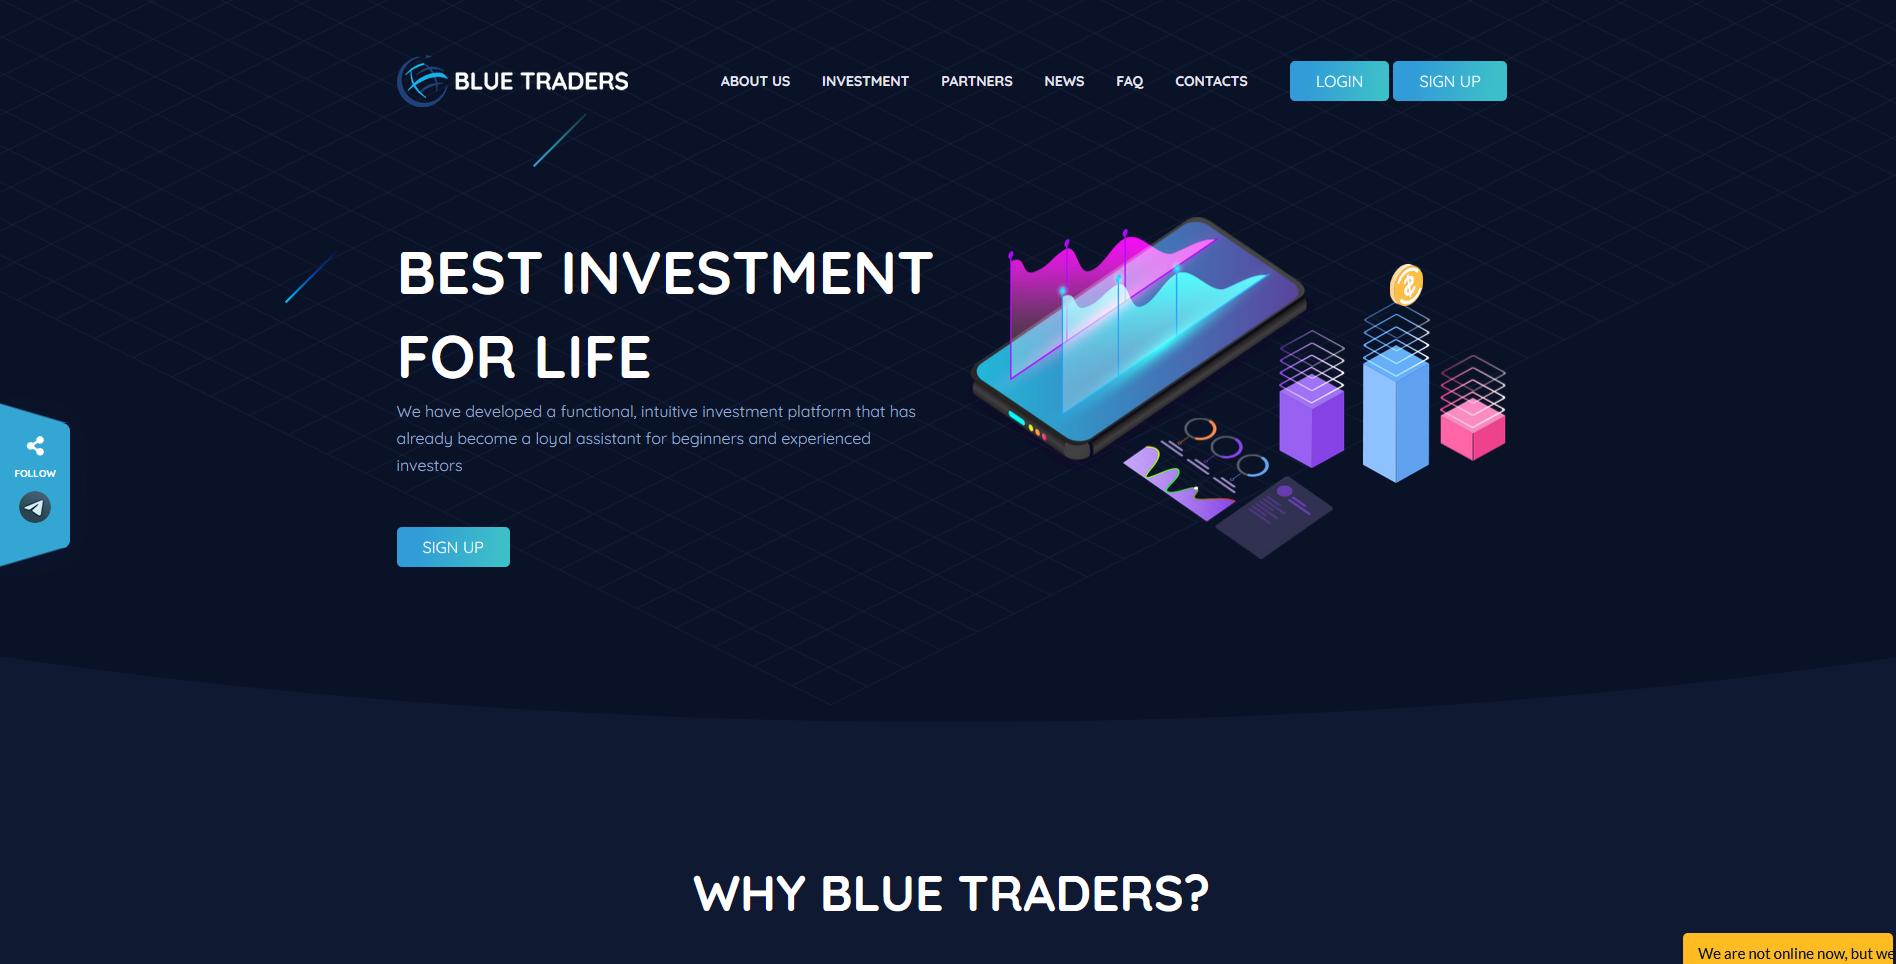 Blue Traders - blue-traders.com